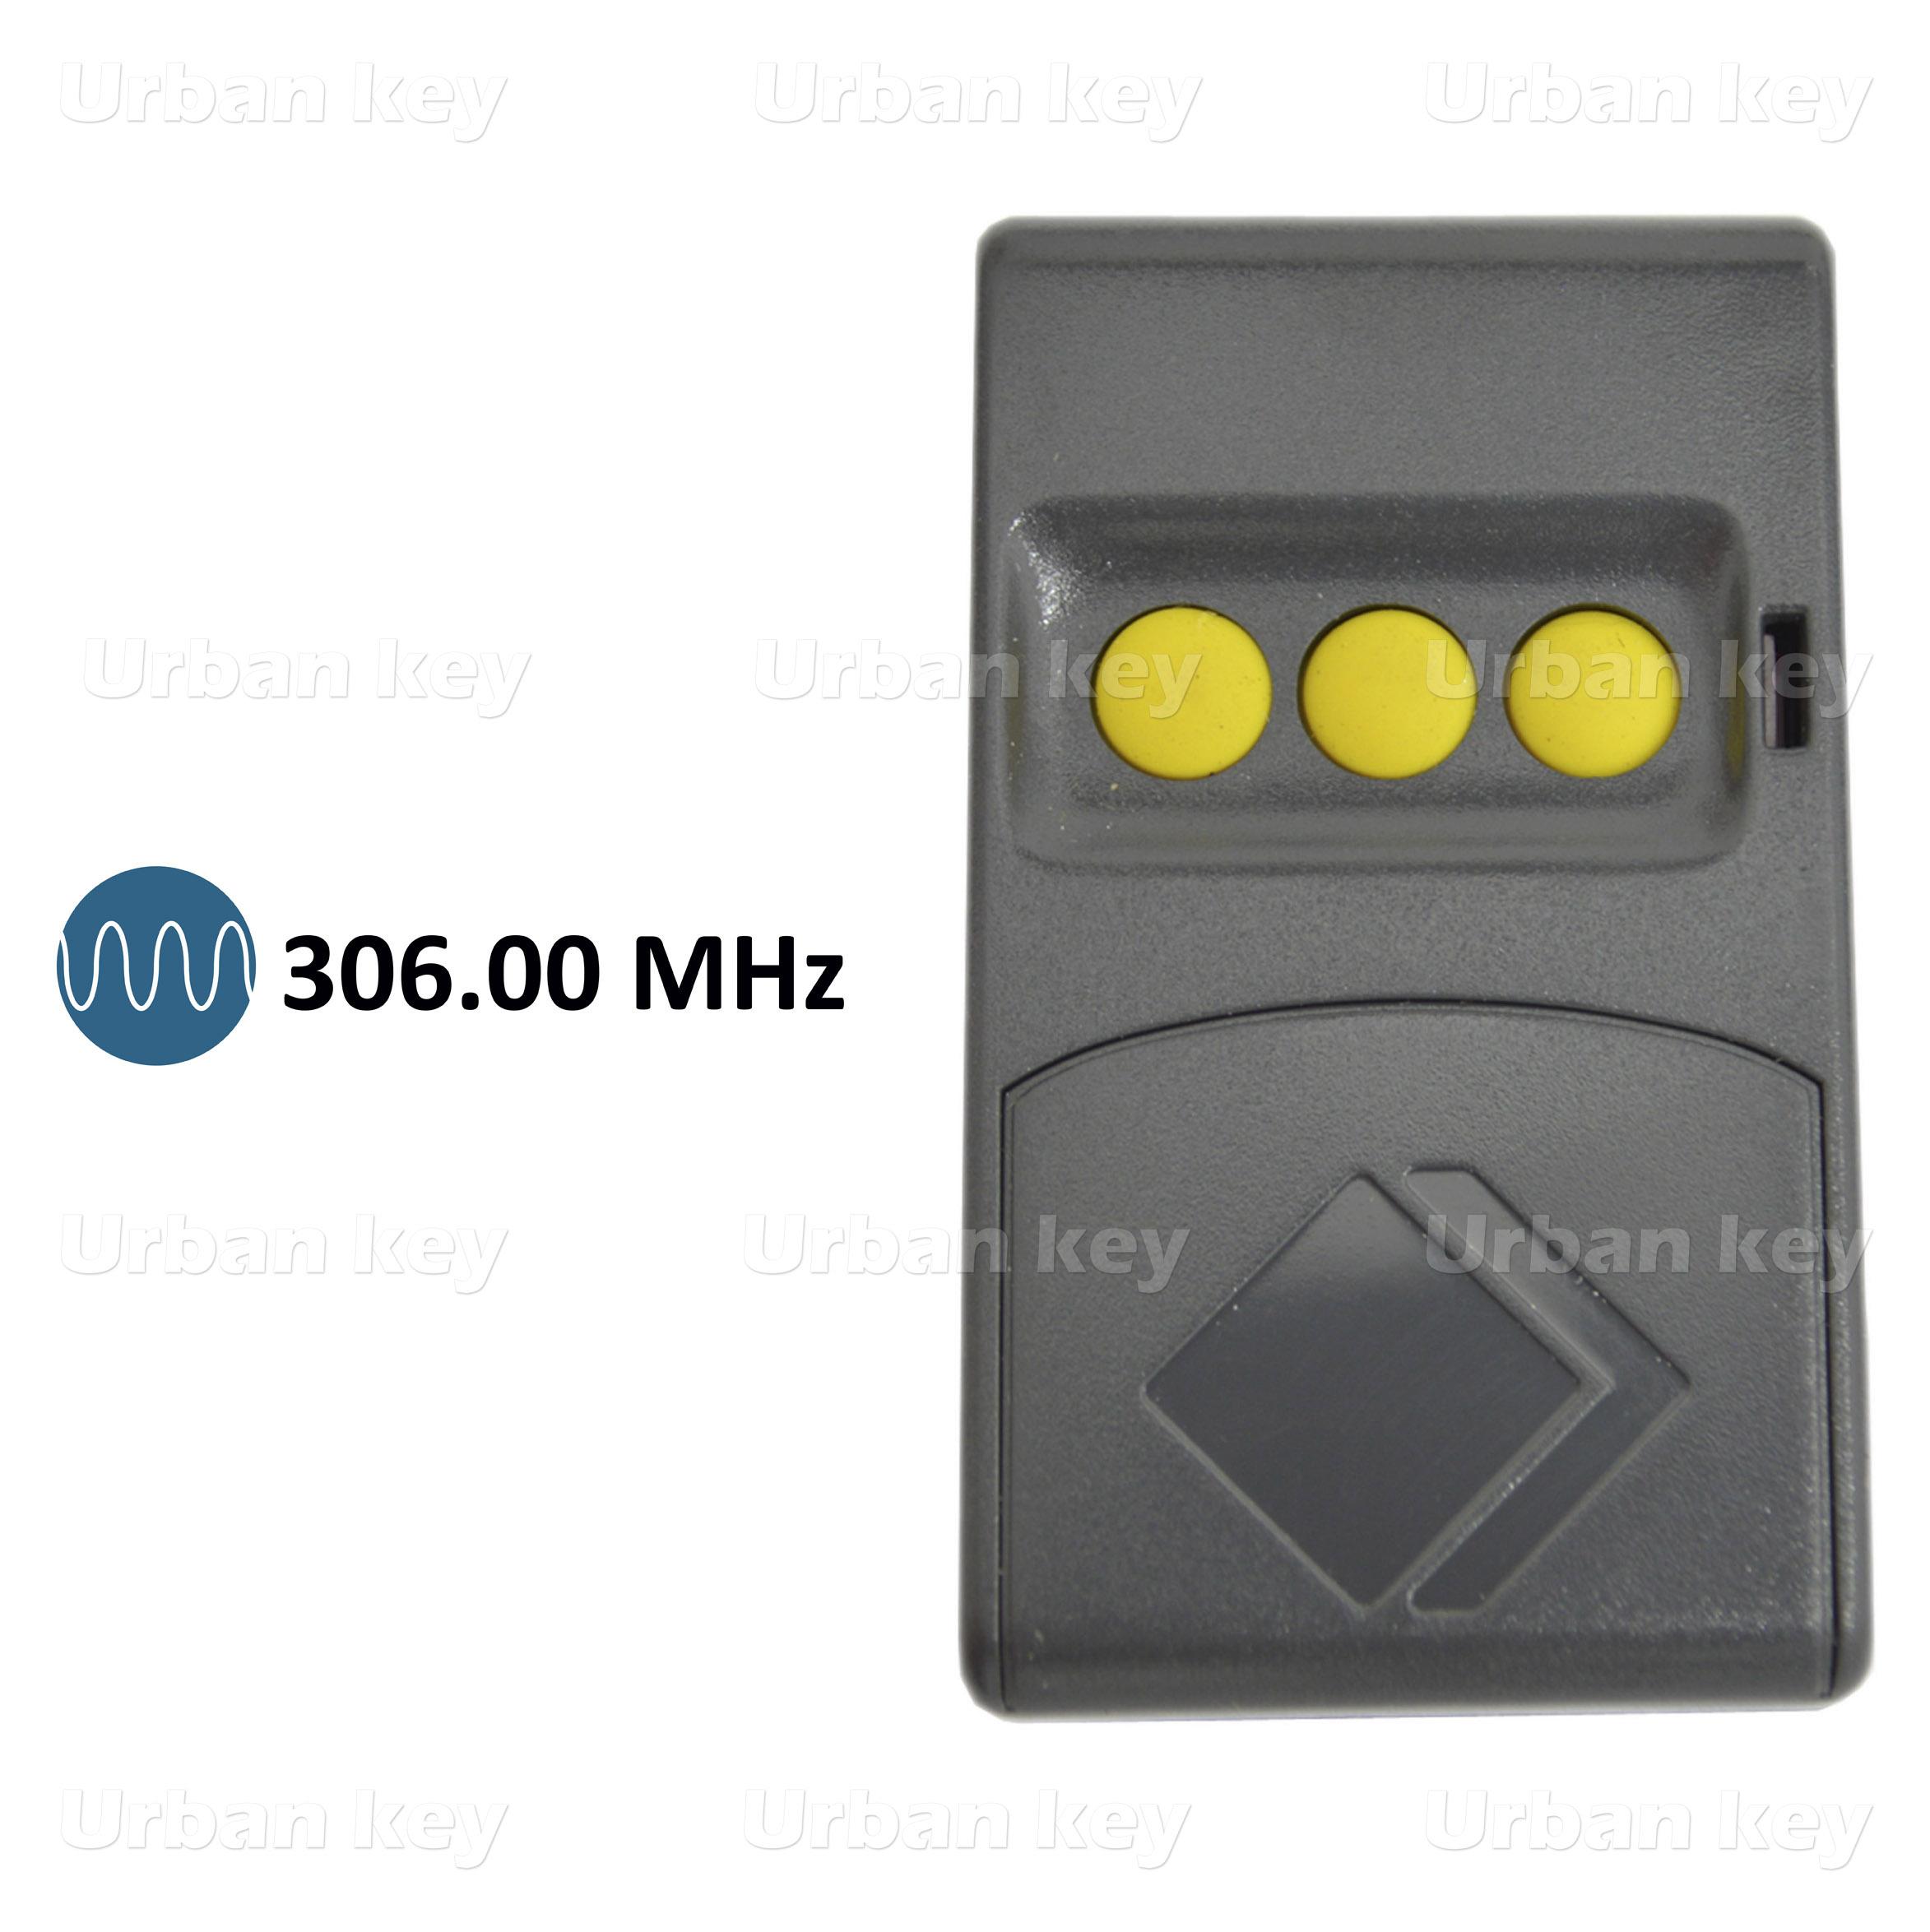 EMISSOR MOTORLINE MX3  306MHZ 3 CANAIS